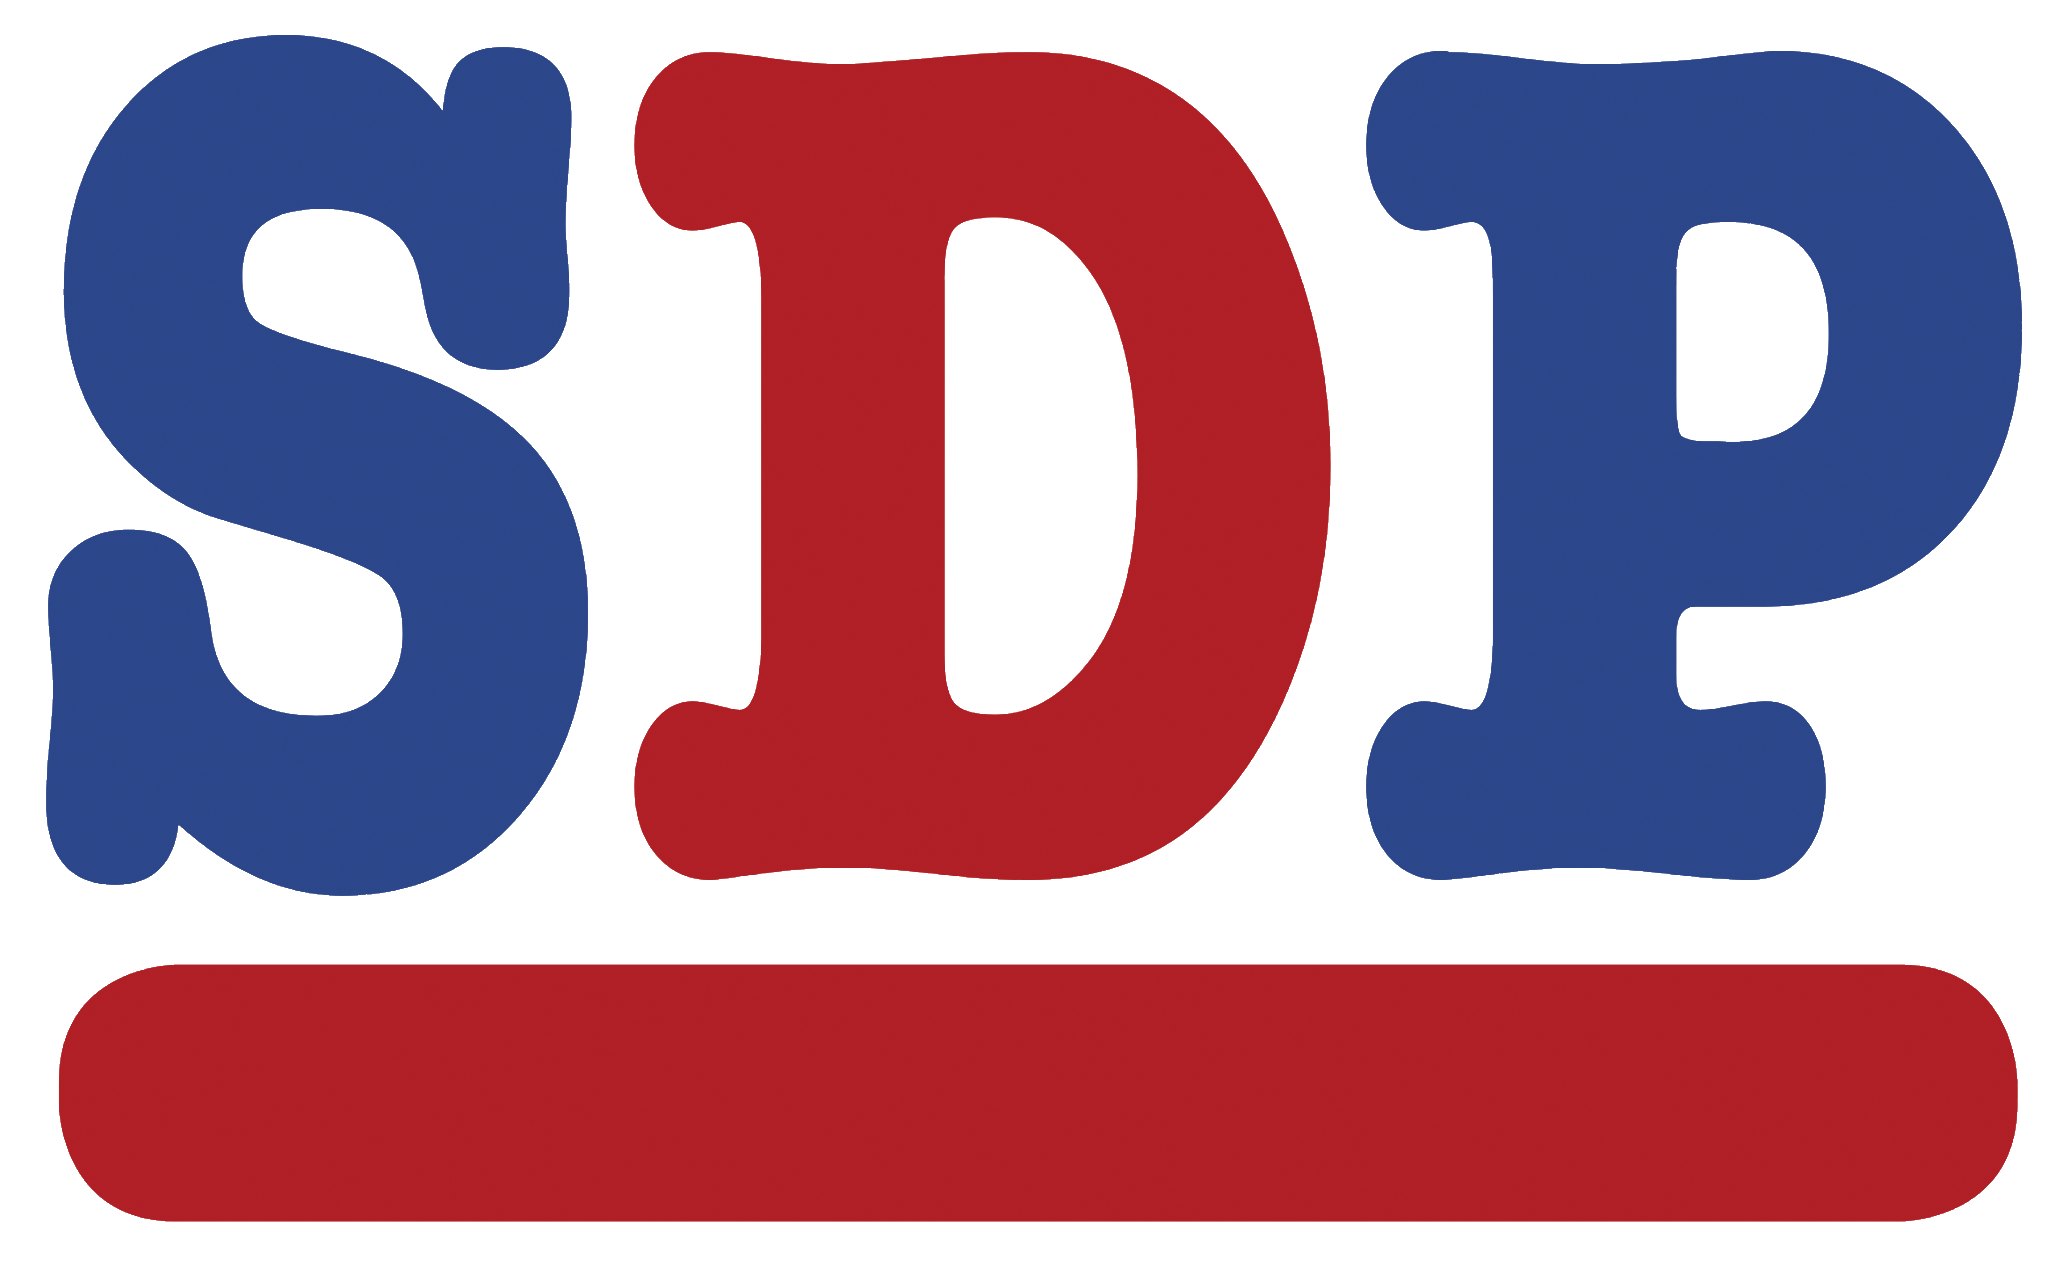 Social Democratic Party (UK) - Wikipedia